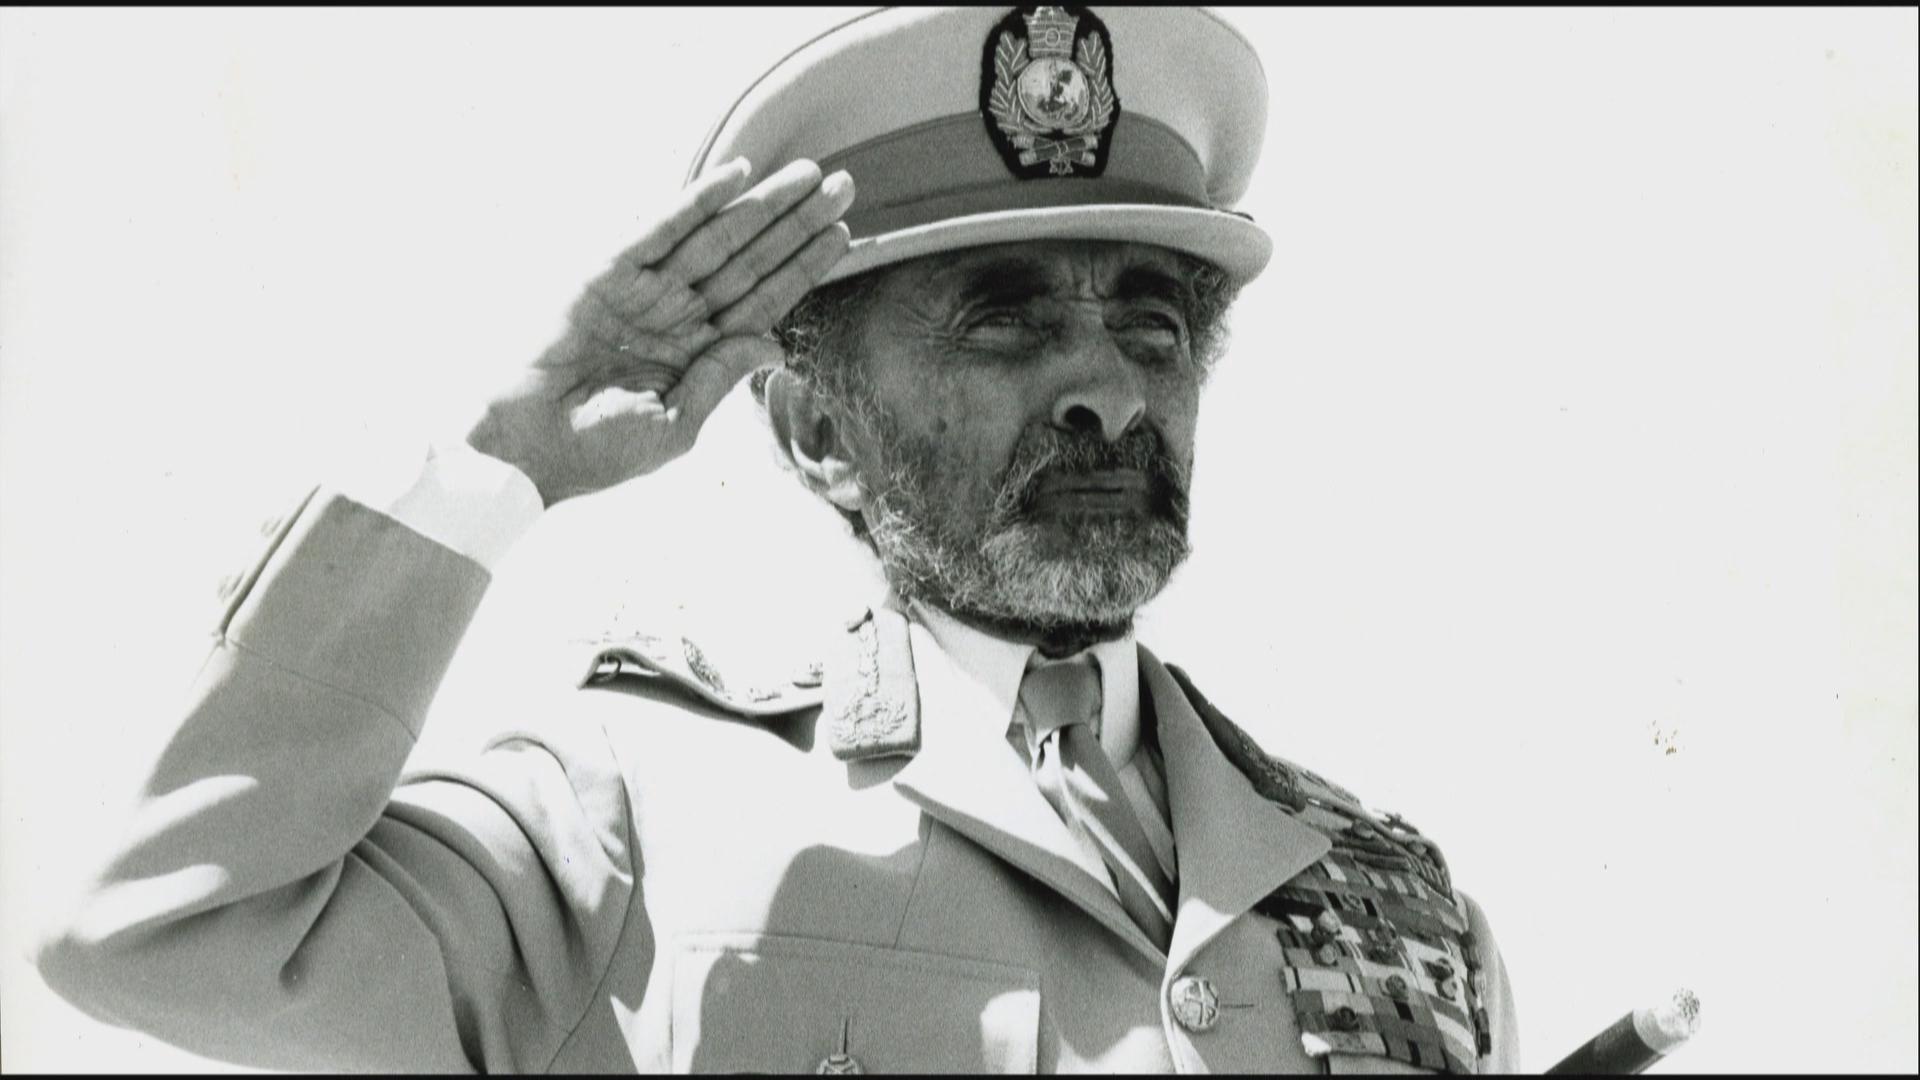 Emperor Haile Selassie of Ethiopia. He was the last Emperor. He died in 1975.